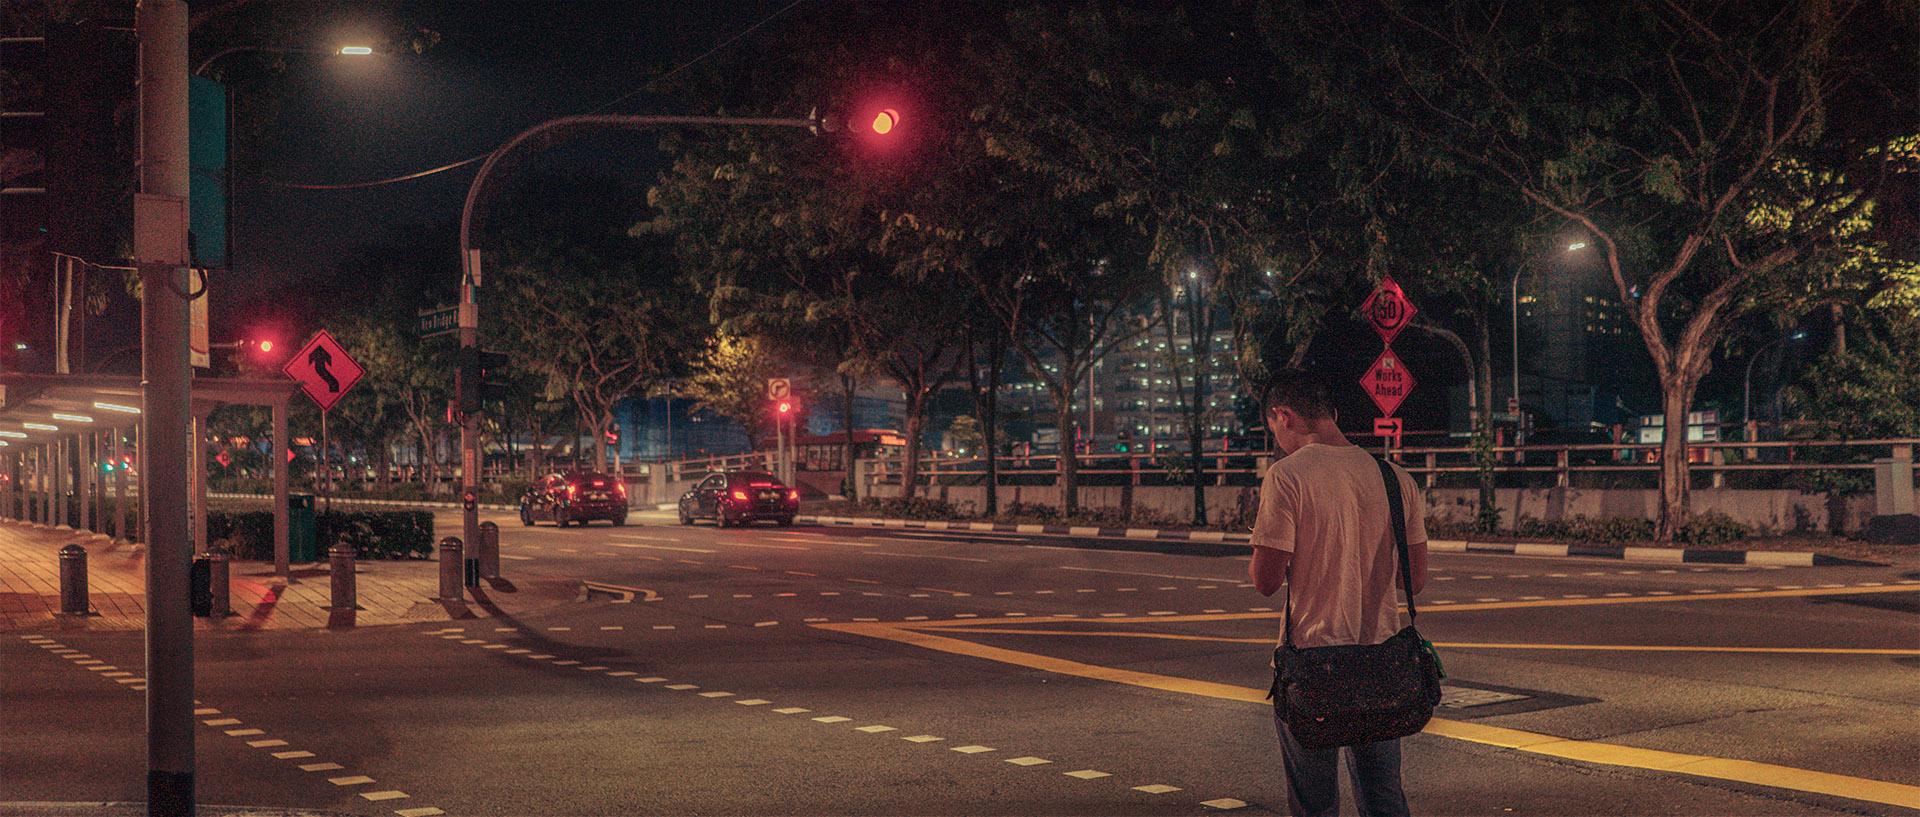 Nikko Pascua Travel photography Singapore_09172.jpg